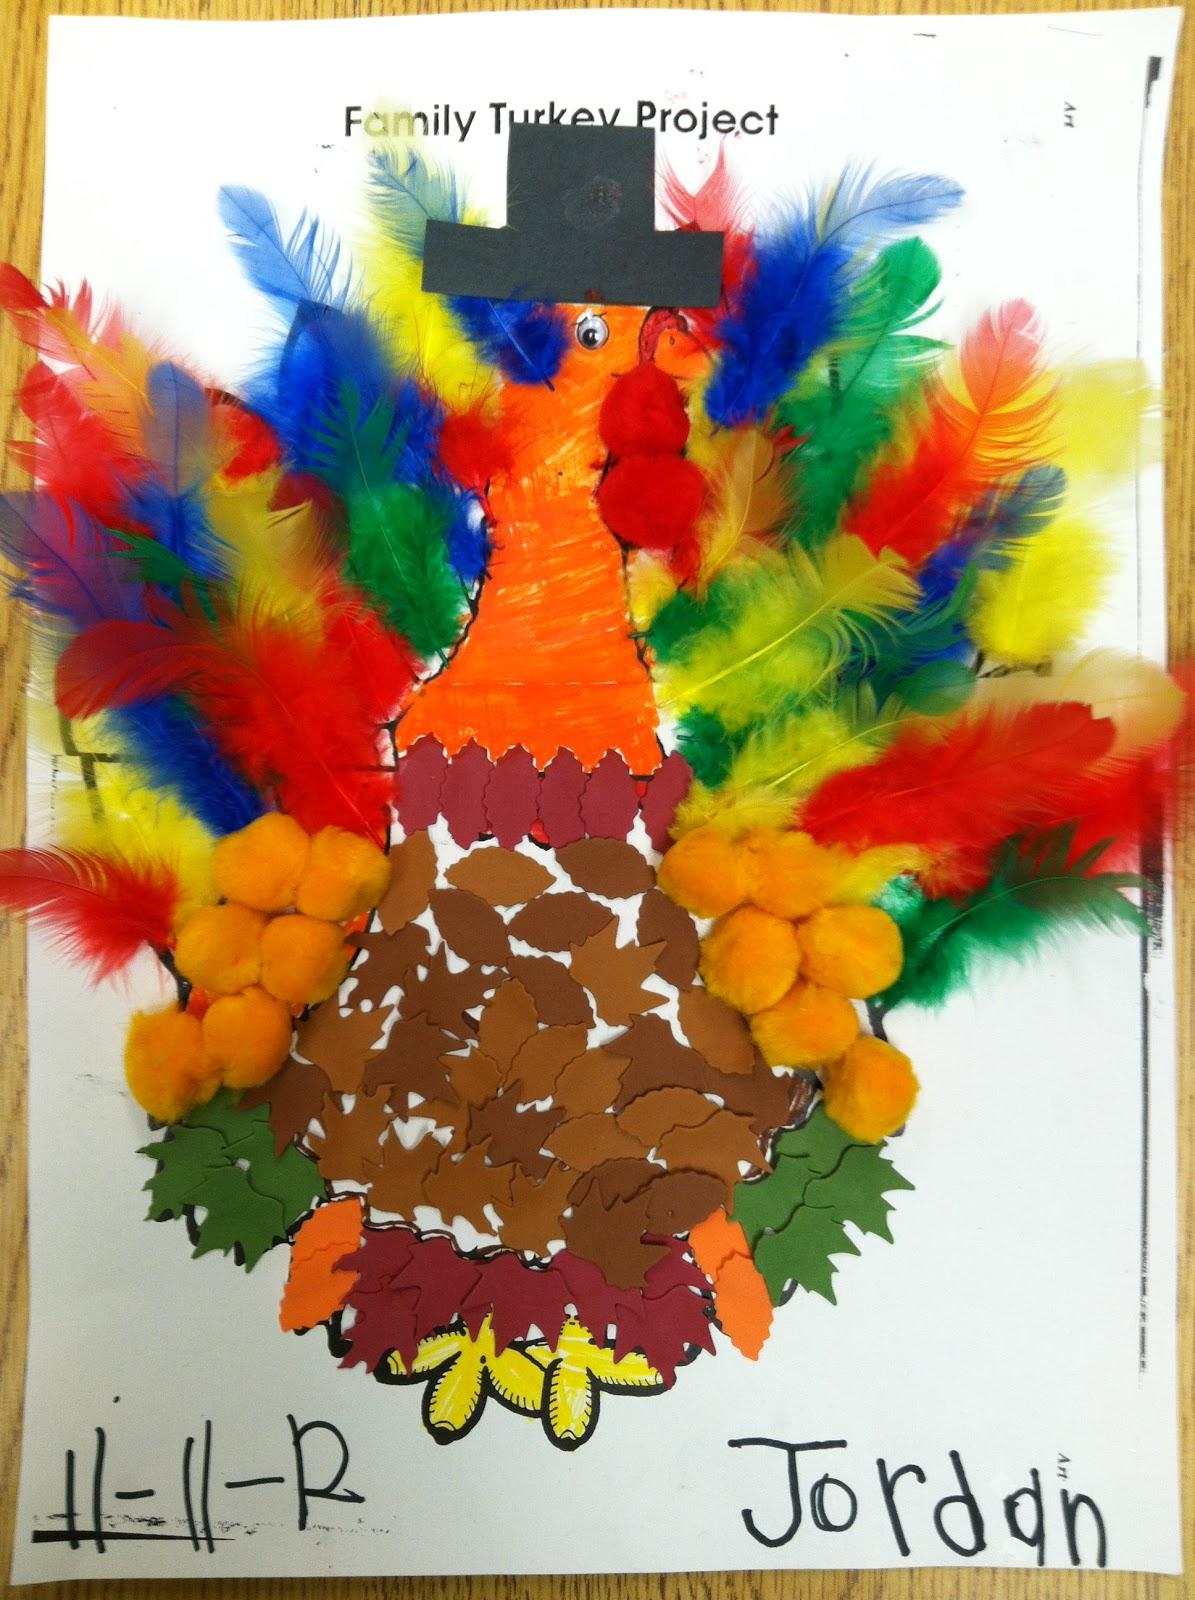 I Heart My Kinder Kids Family Turkey Project